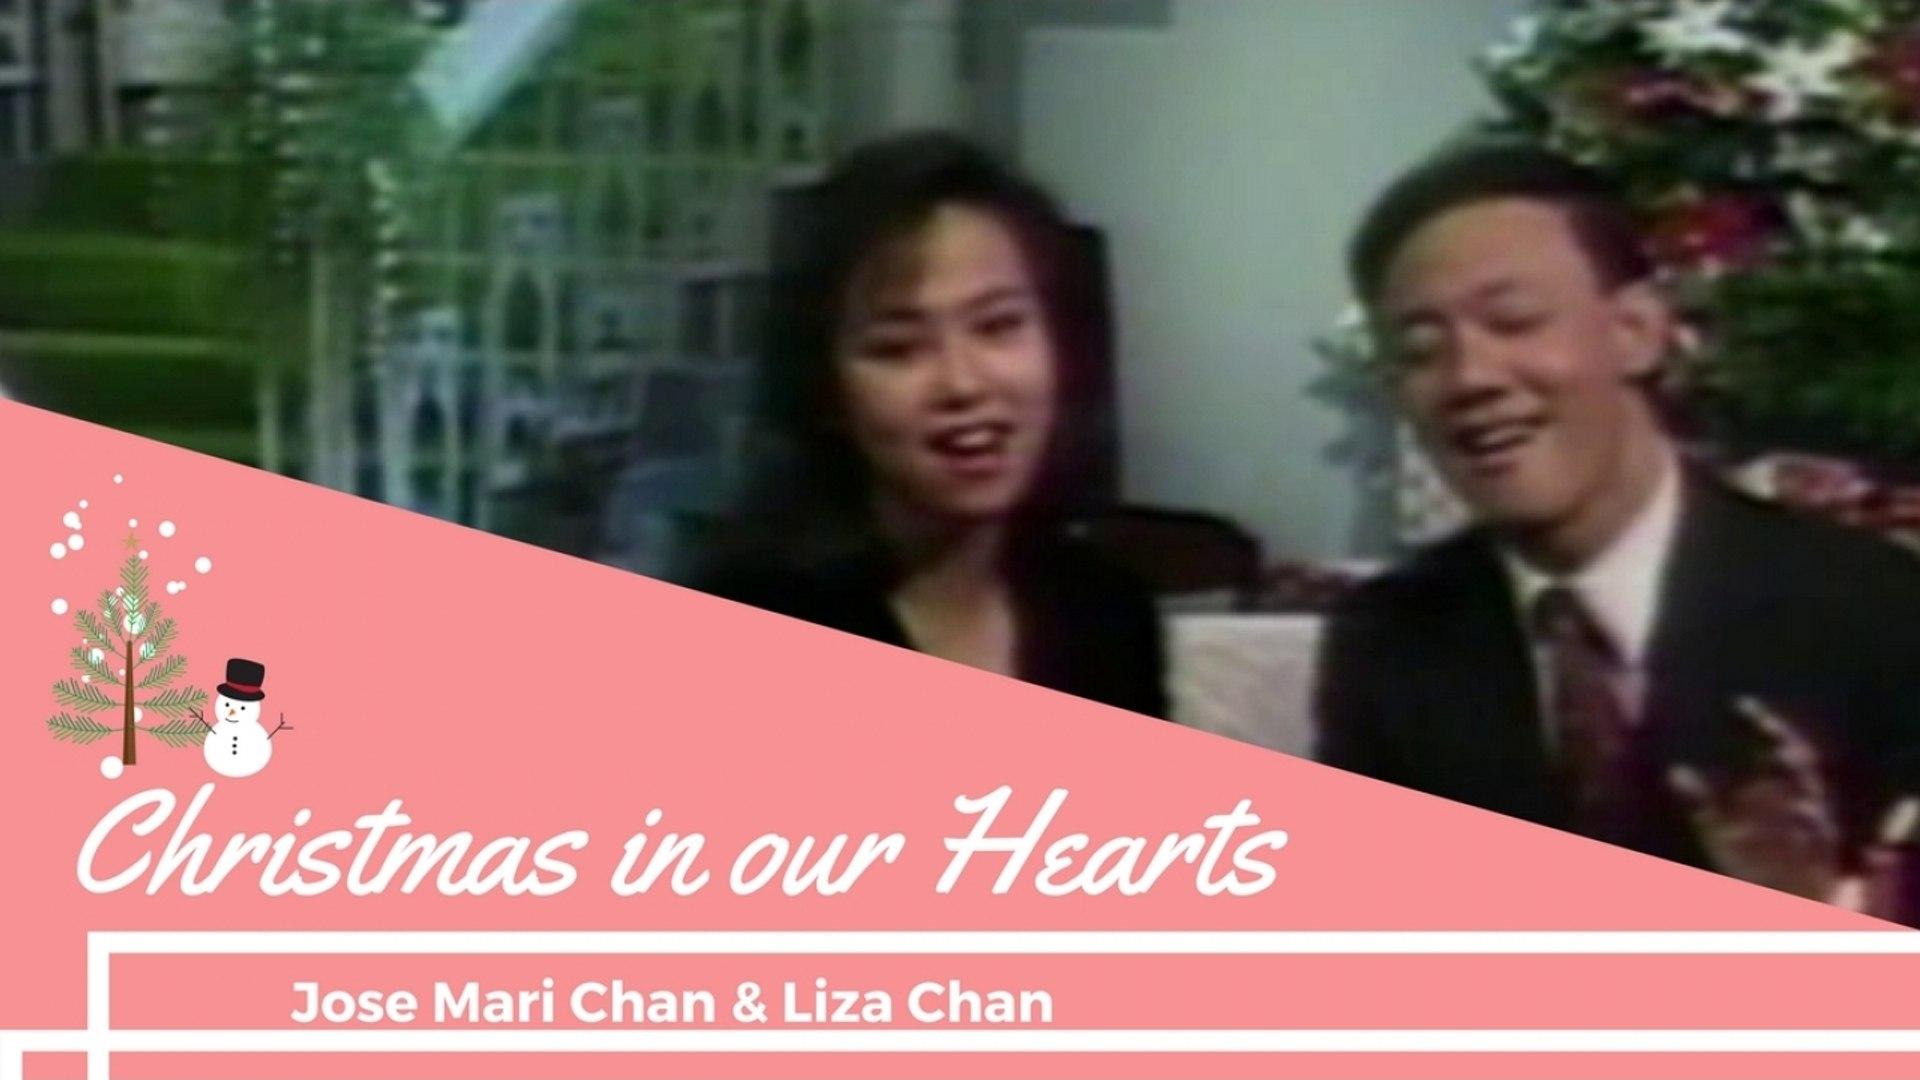 Christmas In Our Hearts.Jose Mari Chan Liza Chan Christmas In Our Hearts Official Music Video